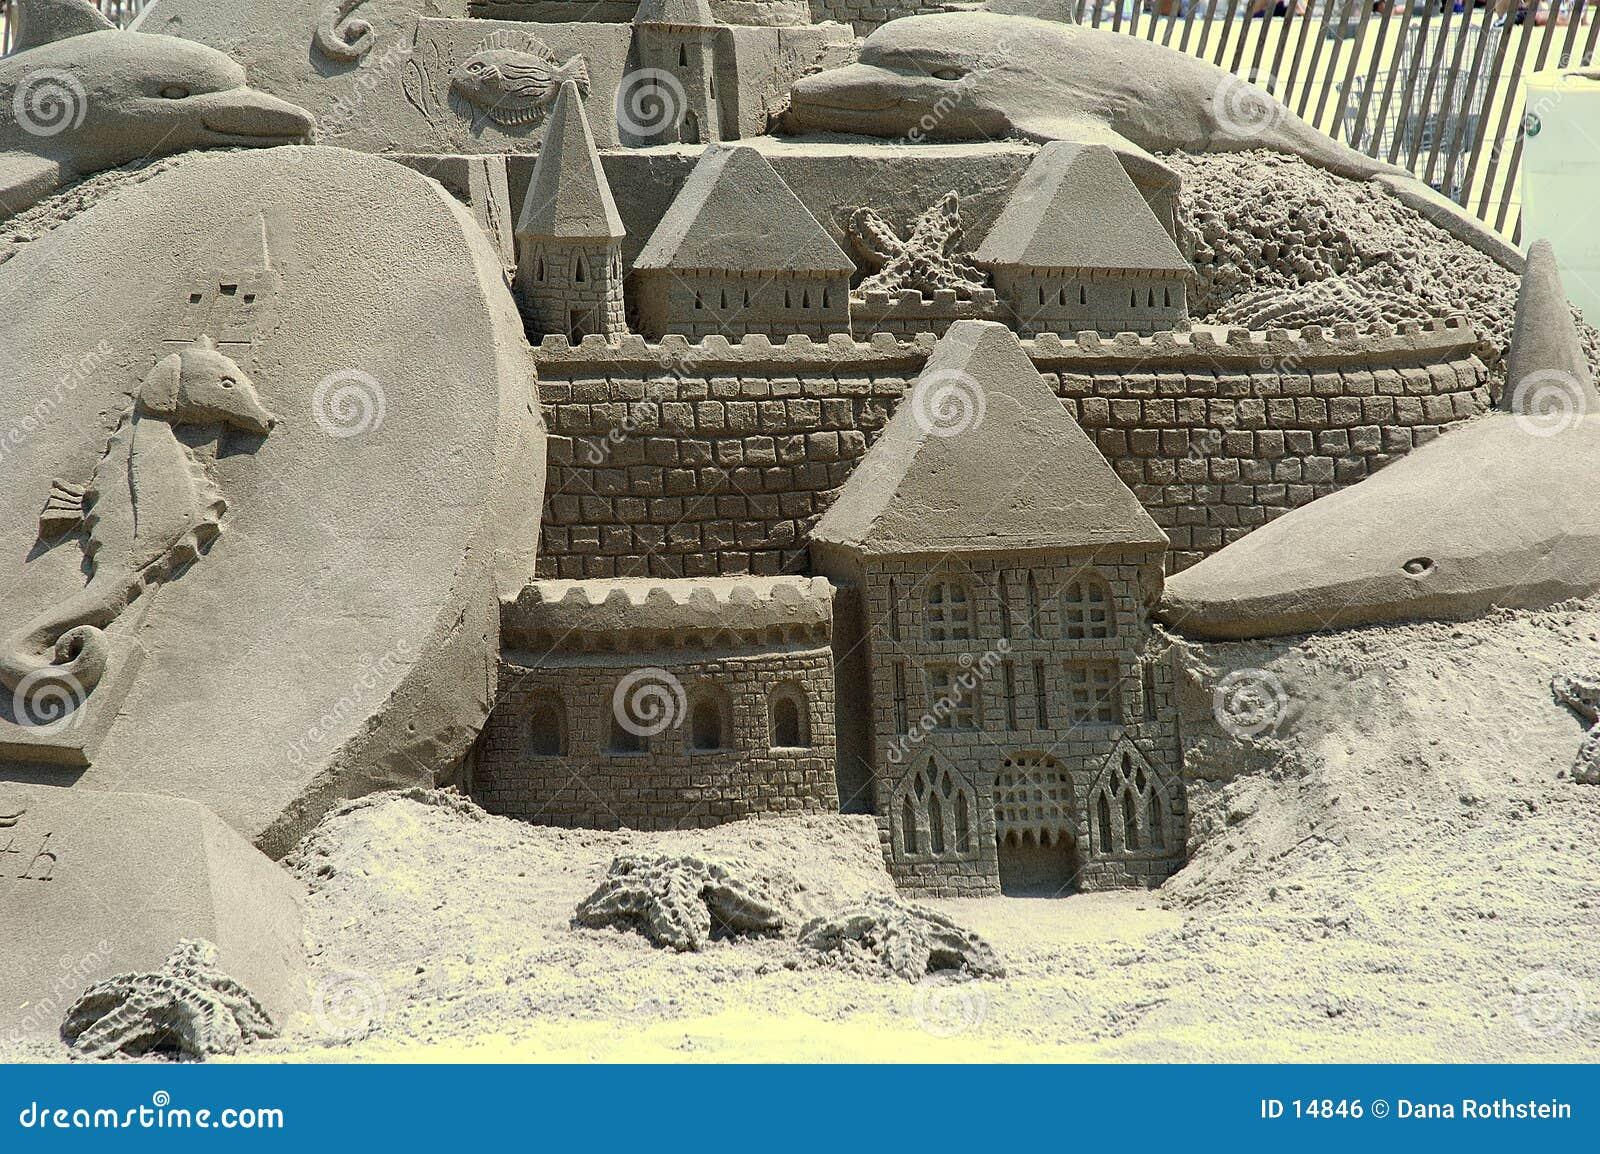 Castillo de arena 2